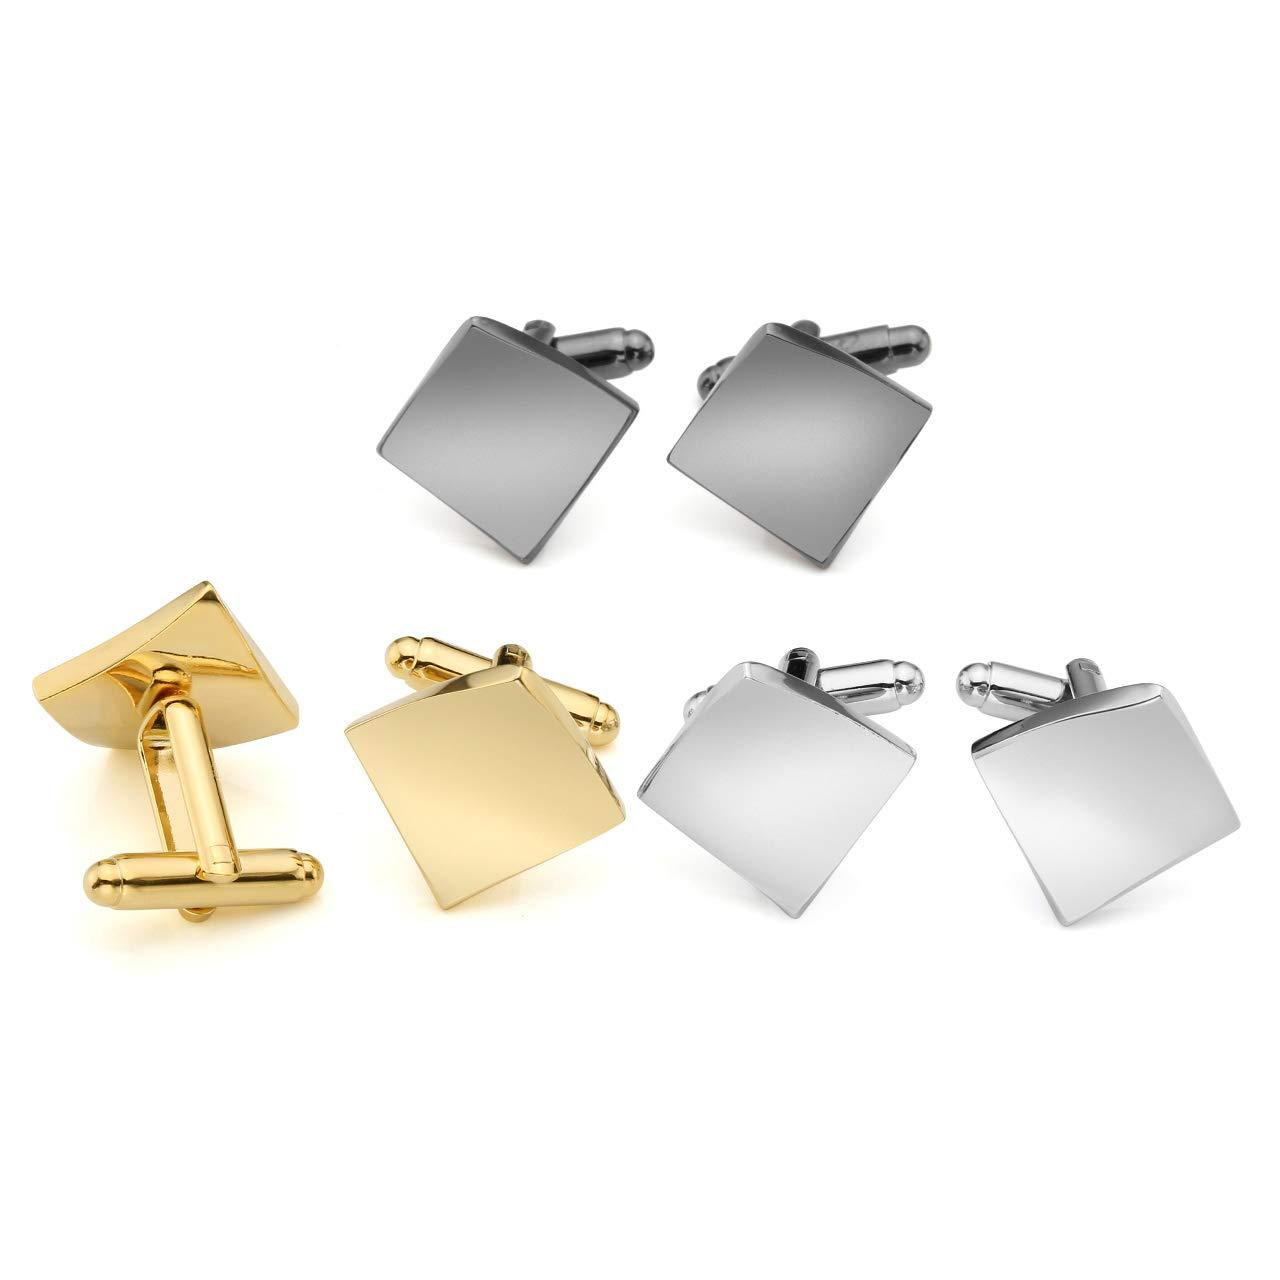 Zysta Irregular Curved Twisted Square Mirror Finish Cufflinks Set Silver Gold Black Bullet Back Secure Closure Button Luxury Elegant Tuxedo Shirts Wedding Busniness Dress